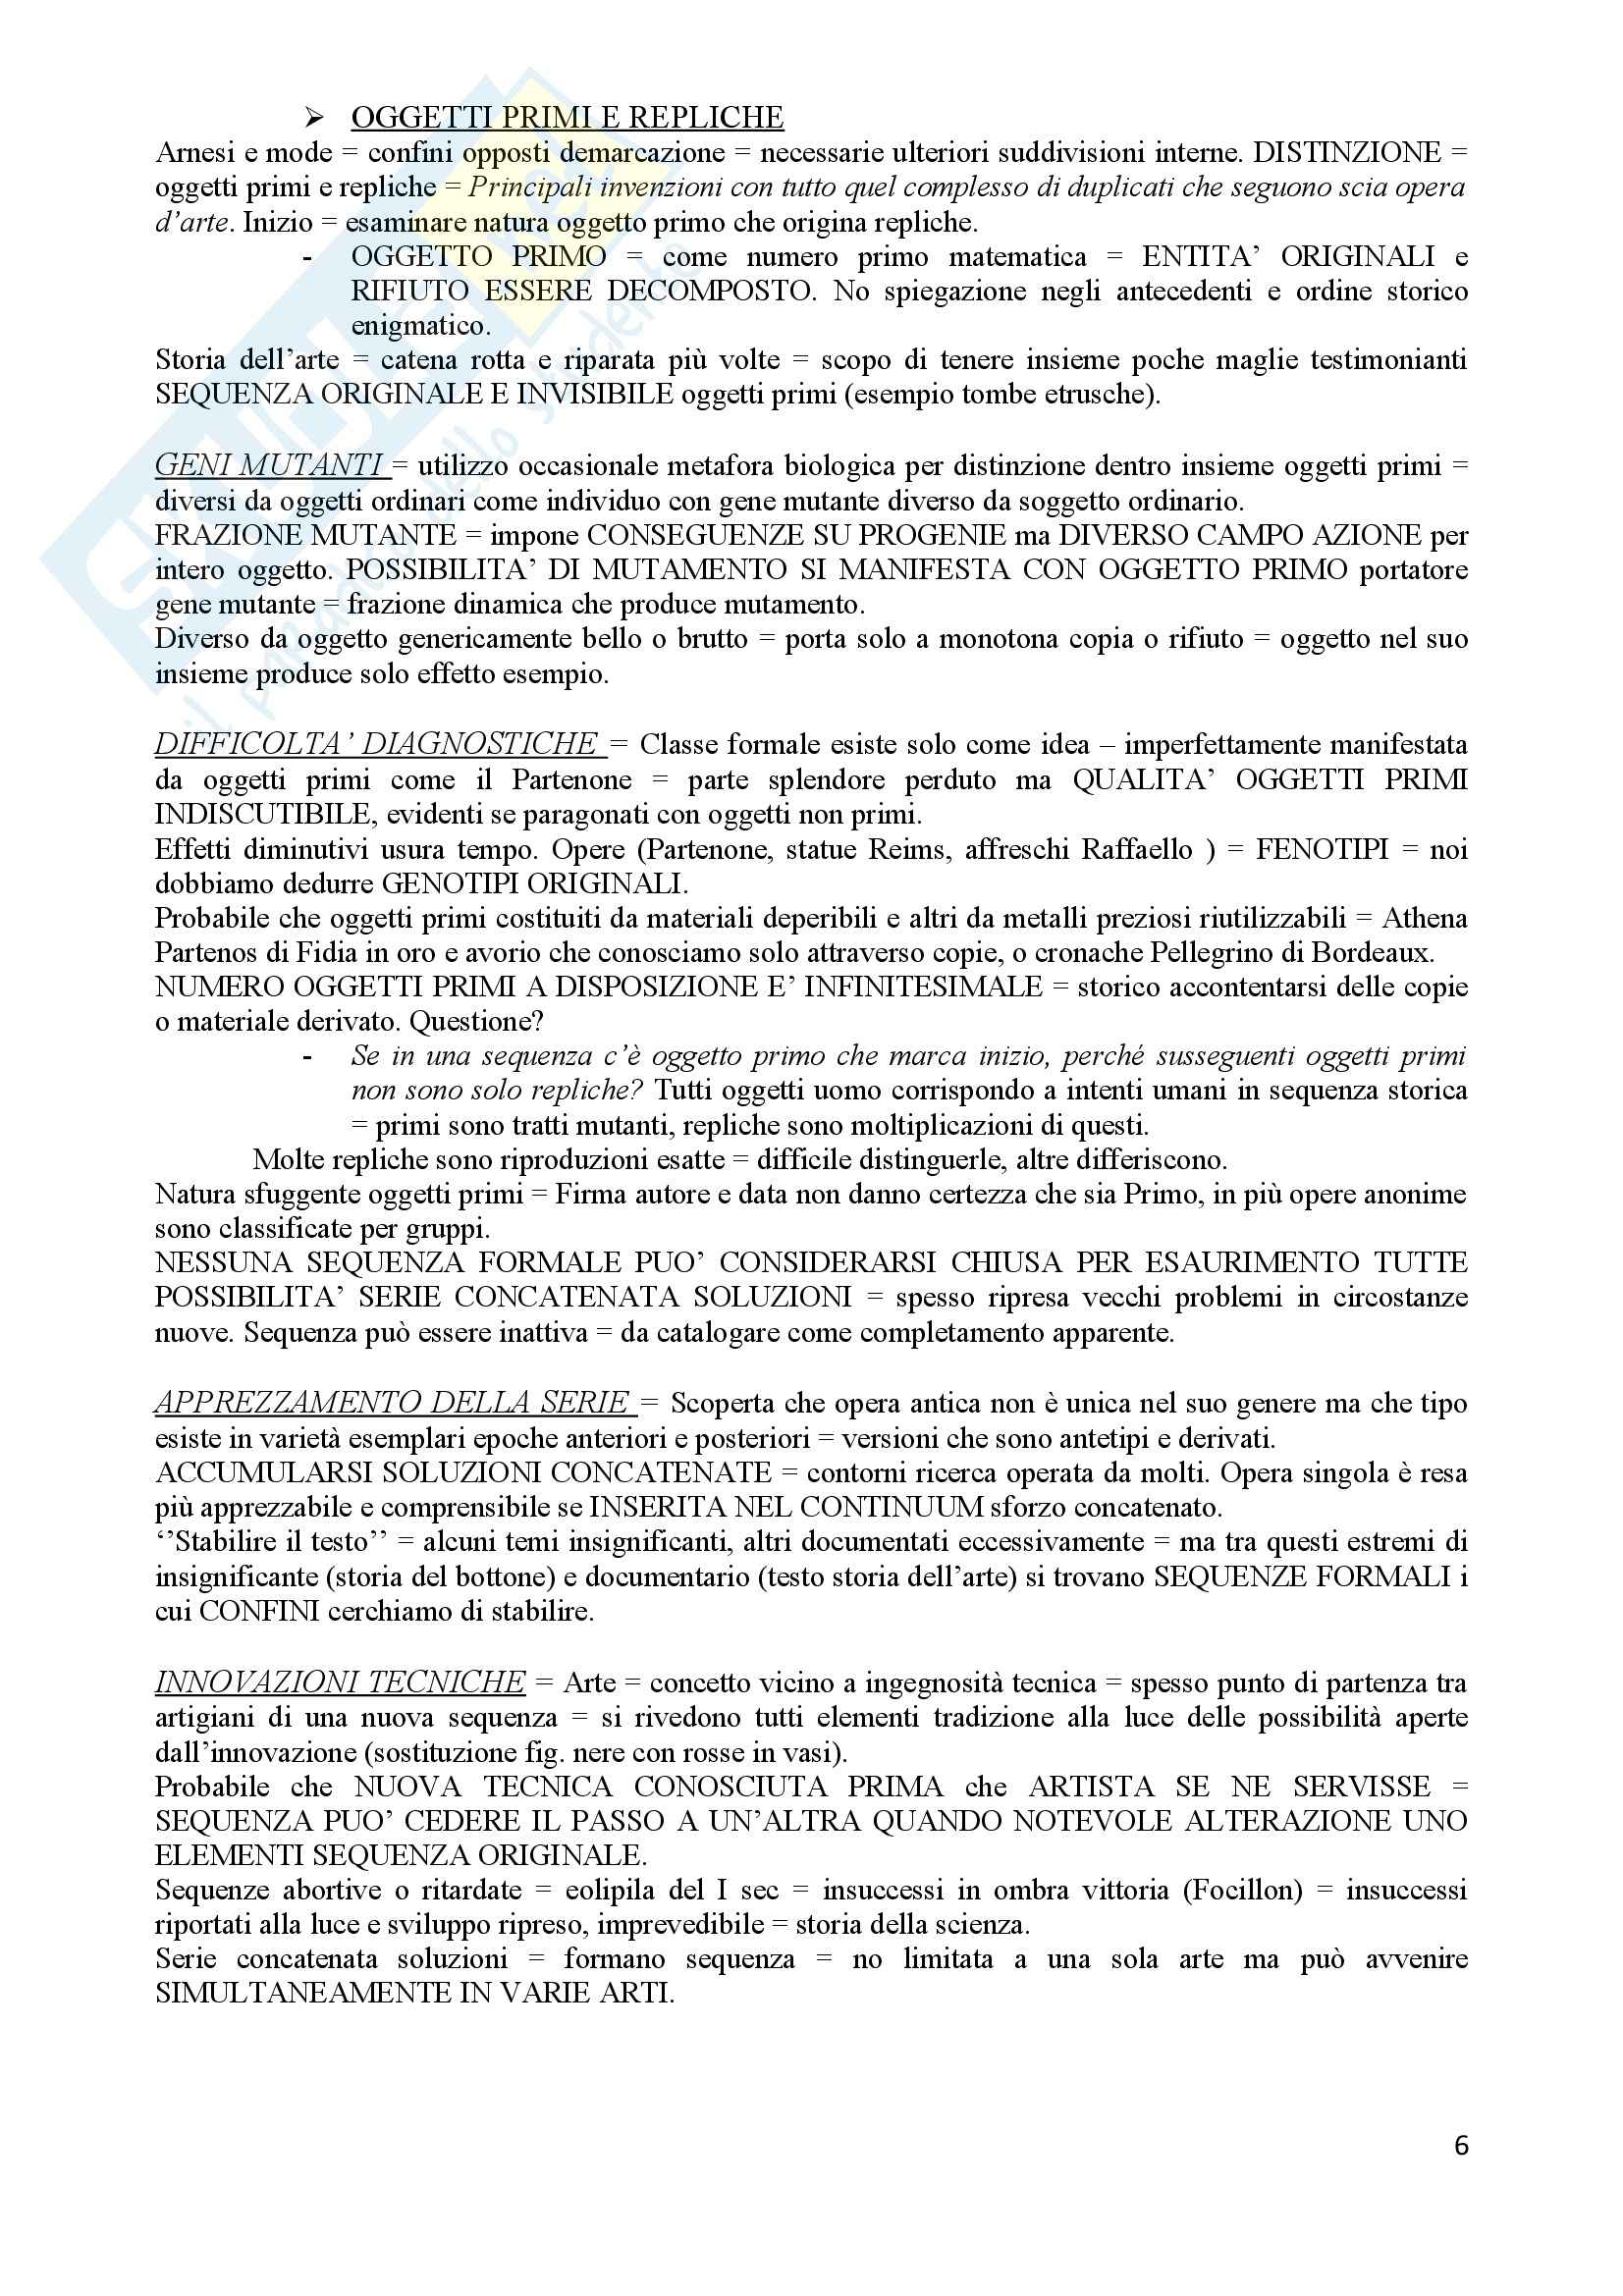 Riassunto esame Letteratura, La forma nel tempo, Kubler, prof. Sartor Pag. 6